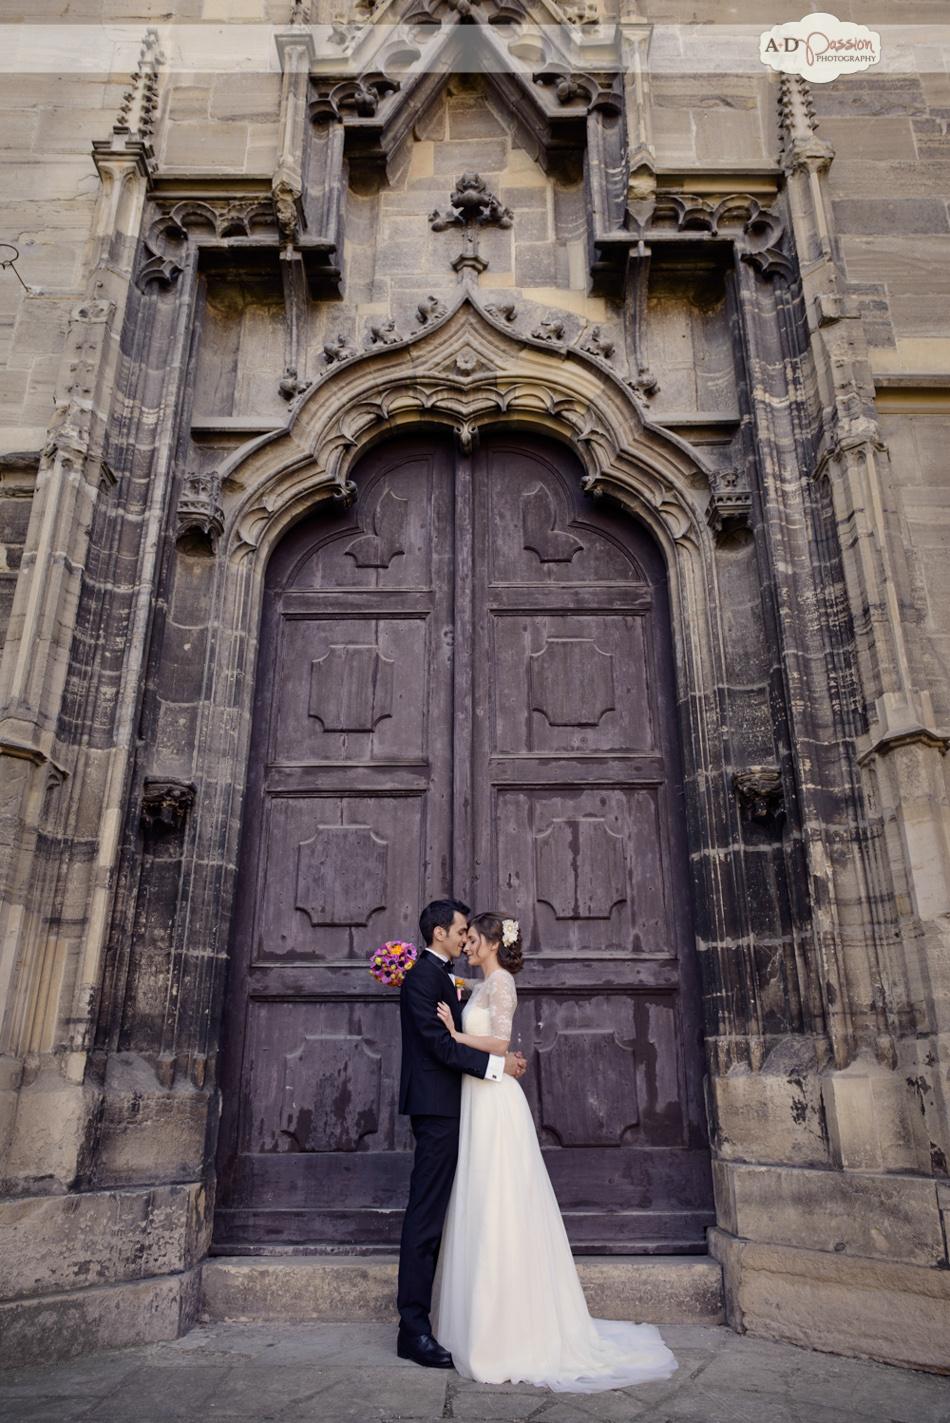 AD Passion Photography | 20130529_fotograf-nunta_elisa_si_marius_0078 | Adelin, Dida, fotograf profesionist, fotograf de nunta, fotografie de nunta, fotograf Timisoara, fotograf Craiova, fotograf Bucuresti, fotograf Arad, nunta Timisoara, nunta Arad, nunta Bucuresti, nunta Craiova